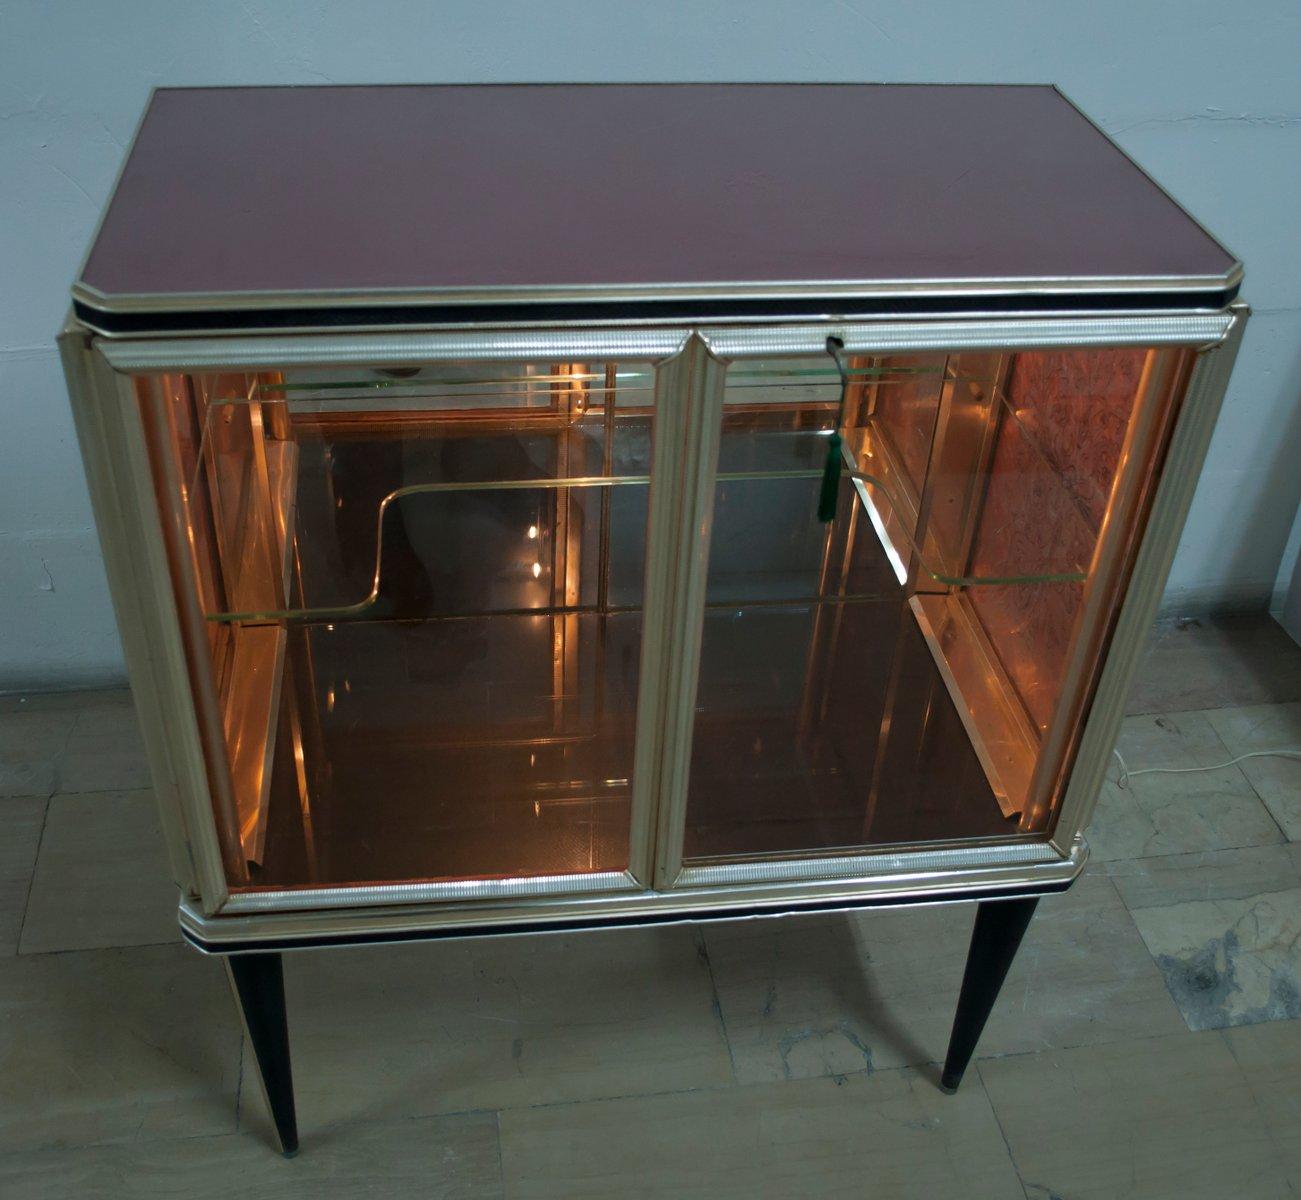 Vintage italian mobile bar cabinet by umberto mascagni 1940s for sale at pamono - Mobile bar vintage ...